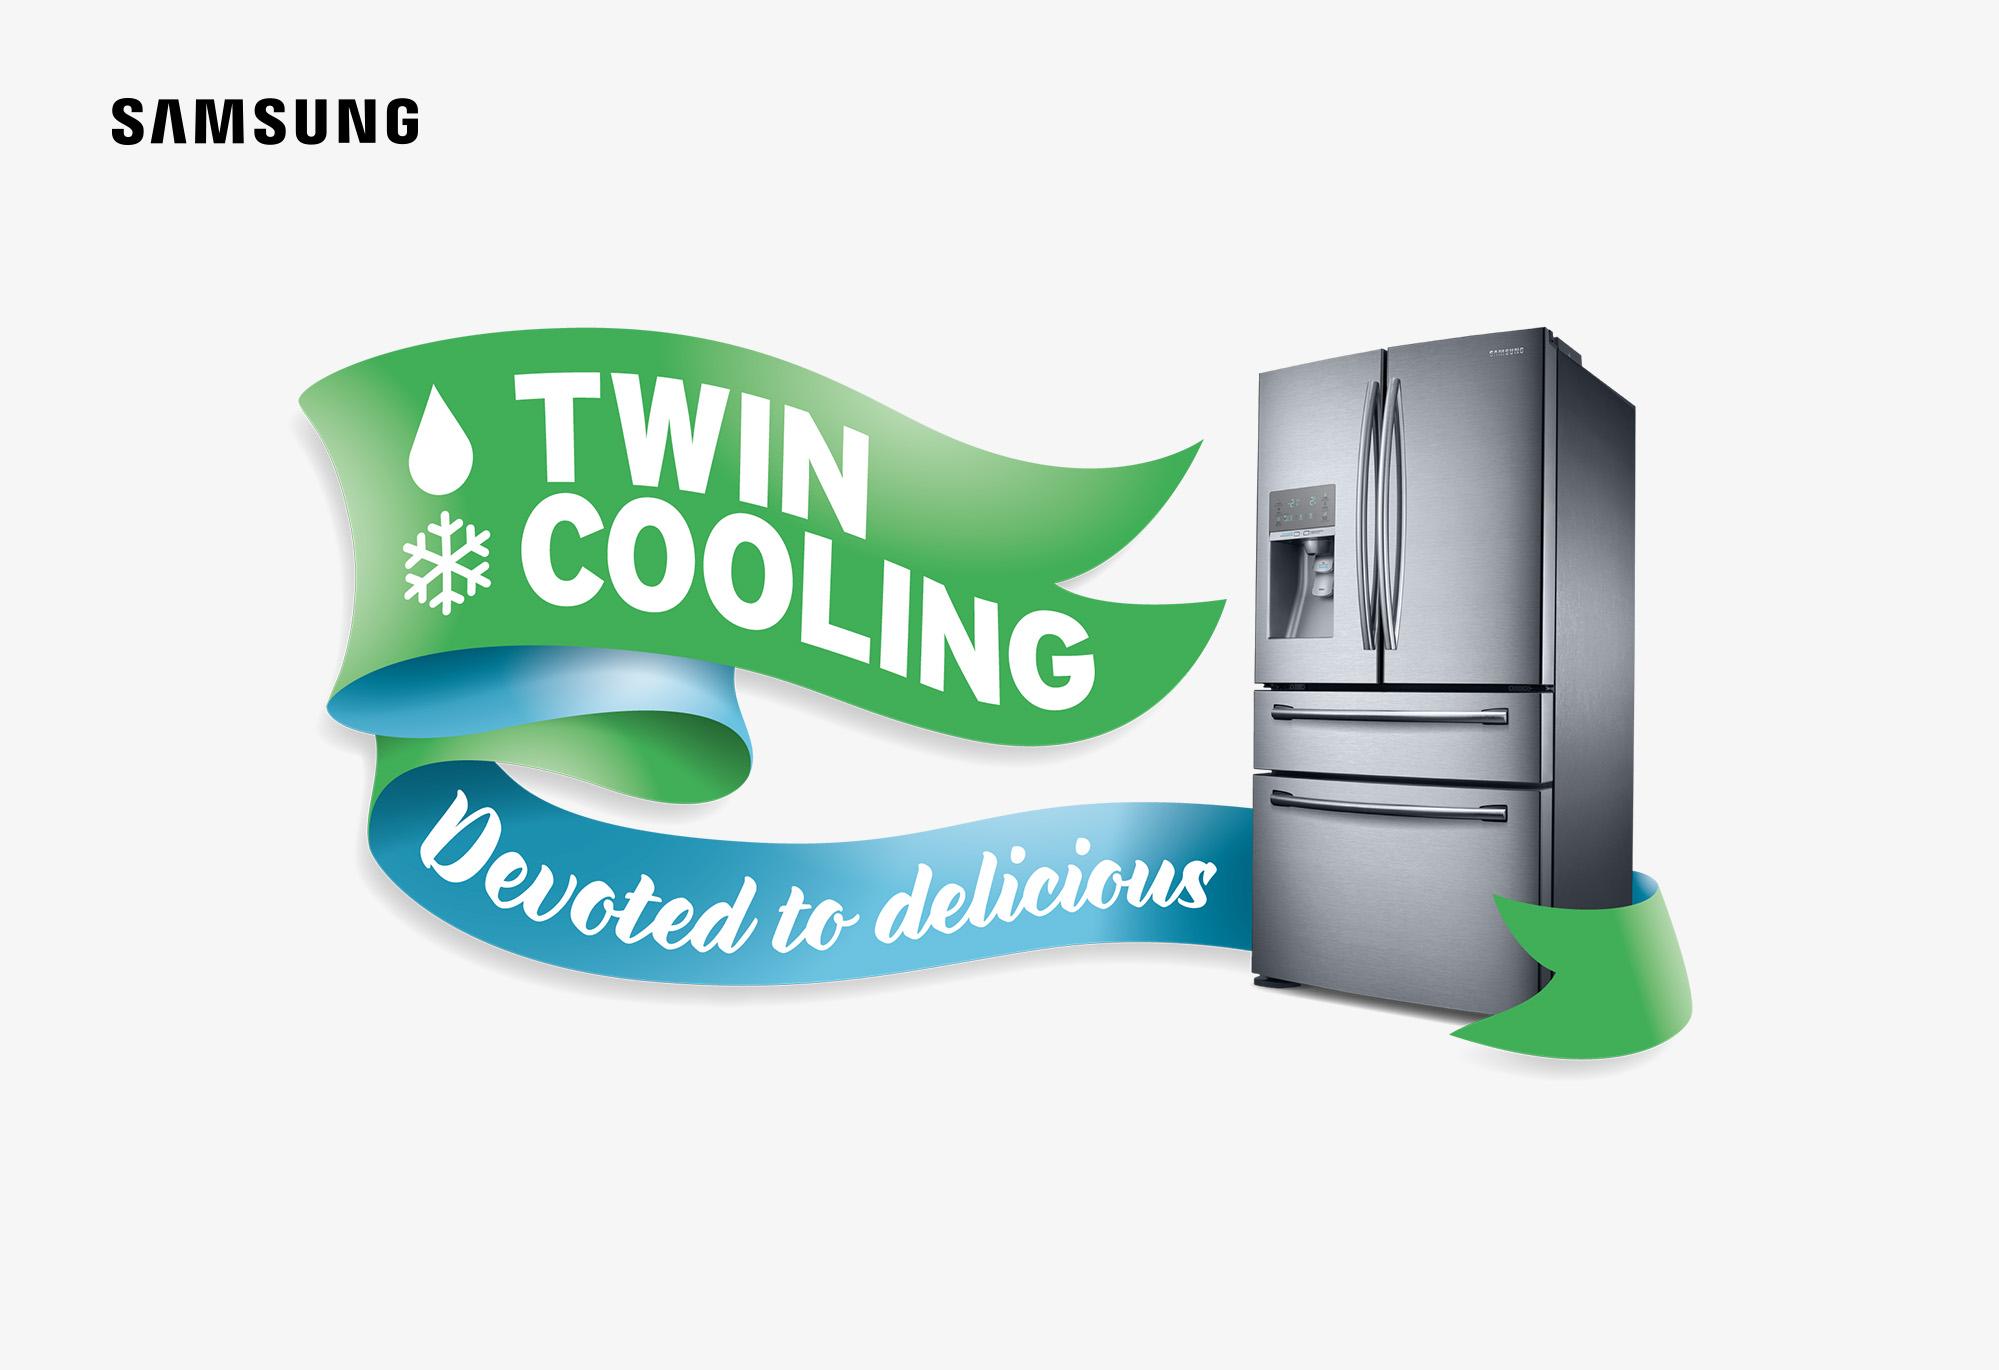 Samsung Twin Cooling logo